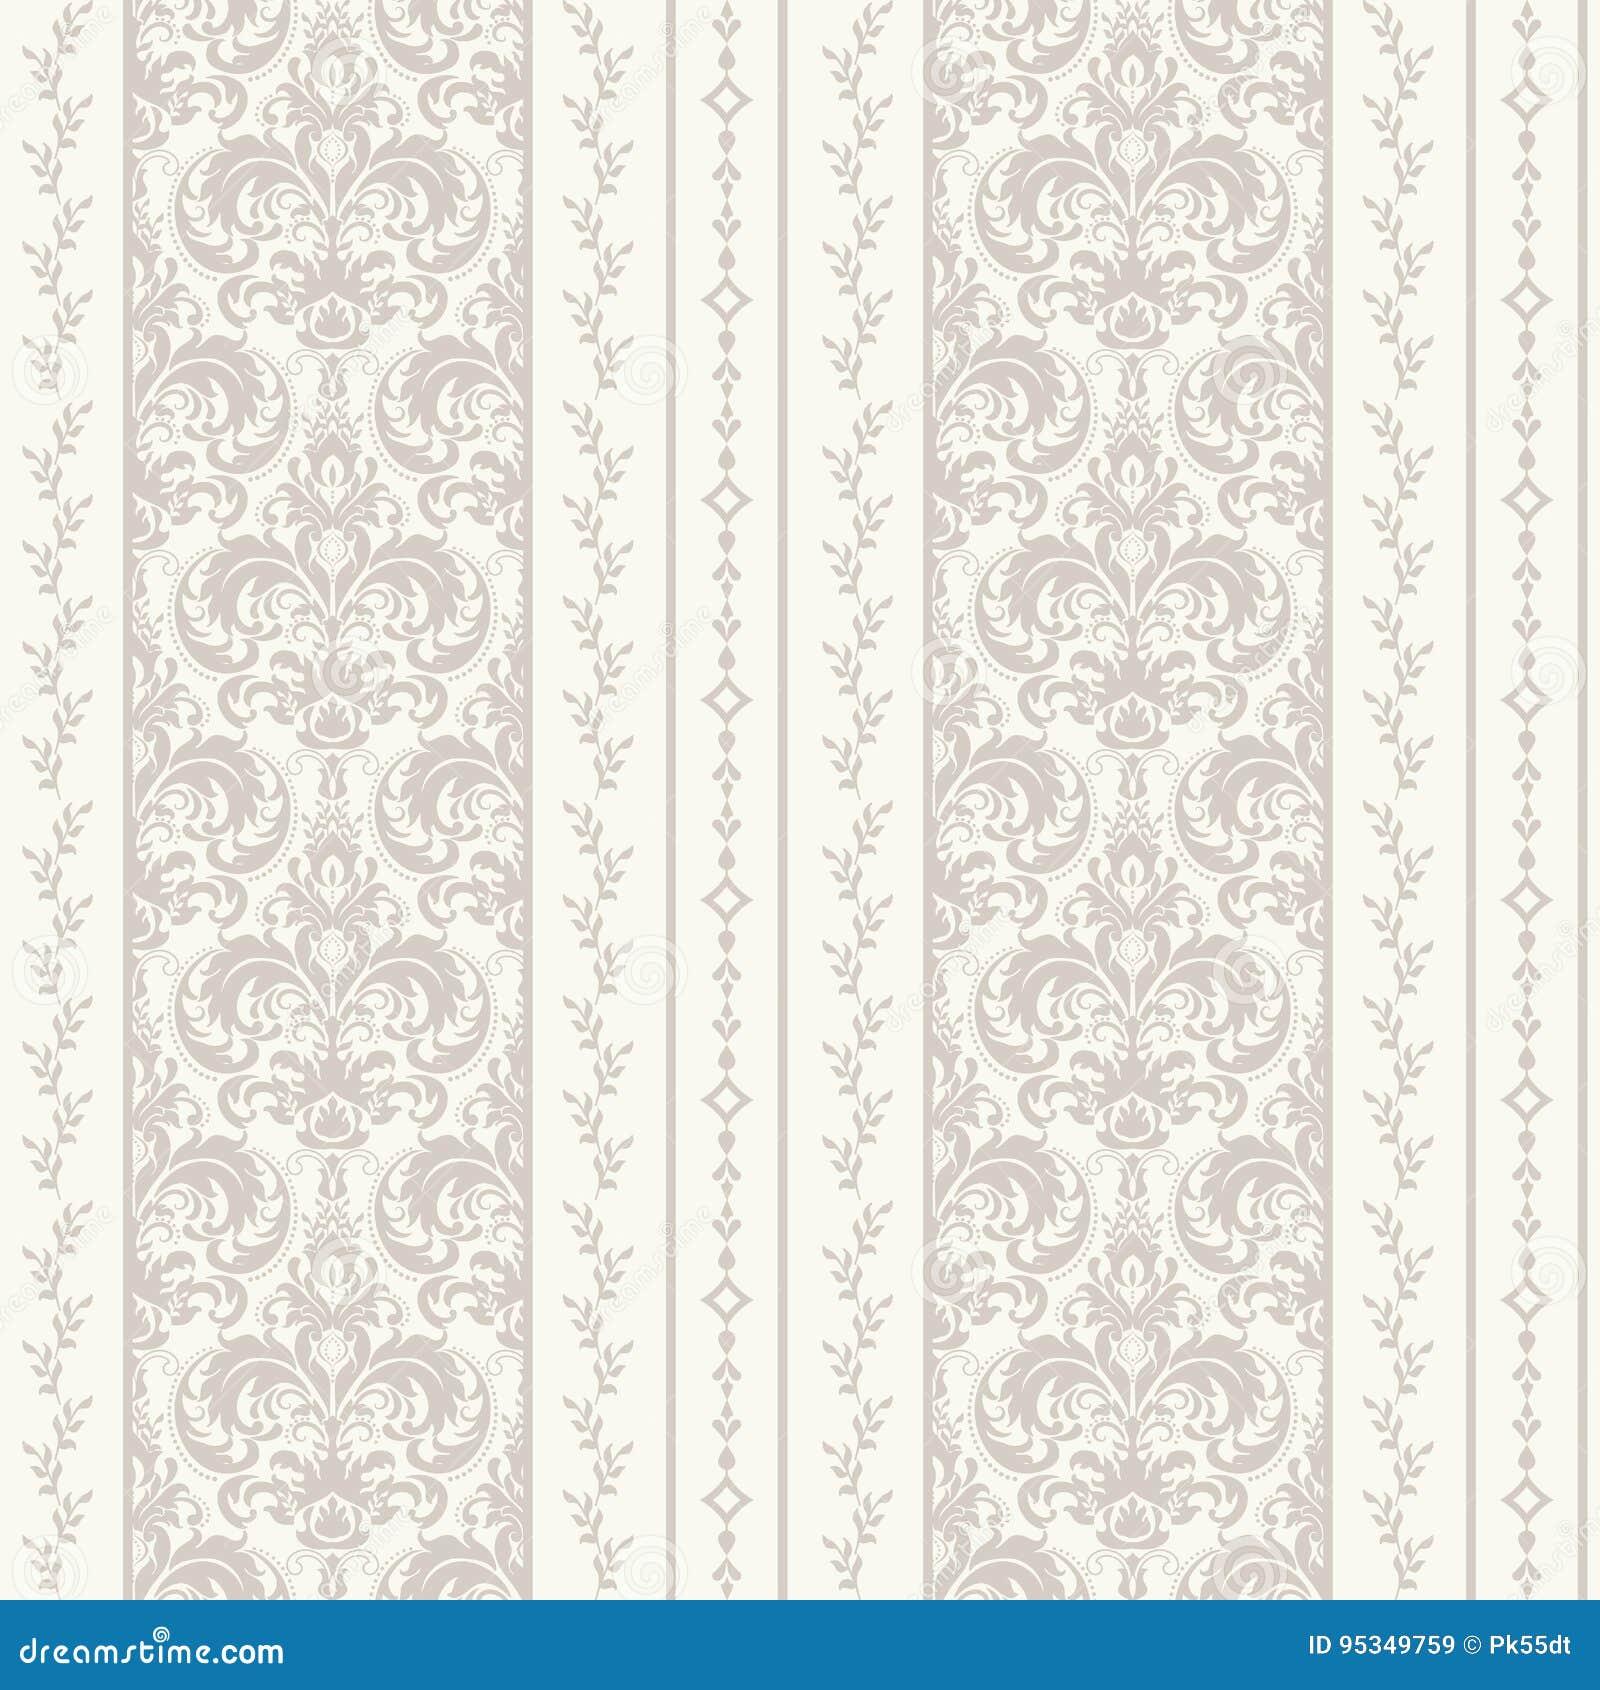 Damask άνευ ραφής υπόβαθρο σχεδίων Κλασσική ντεμοντέ damask πολυτέλειας διακόσμηση, βασιλική βικτοριανή άνευ ραφής σύσταση